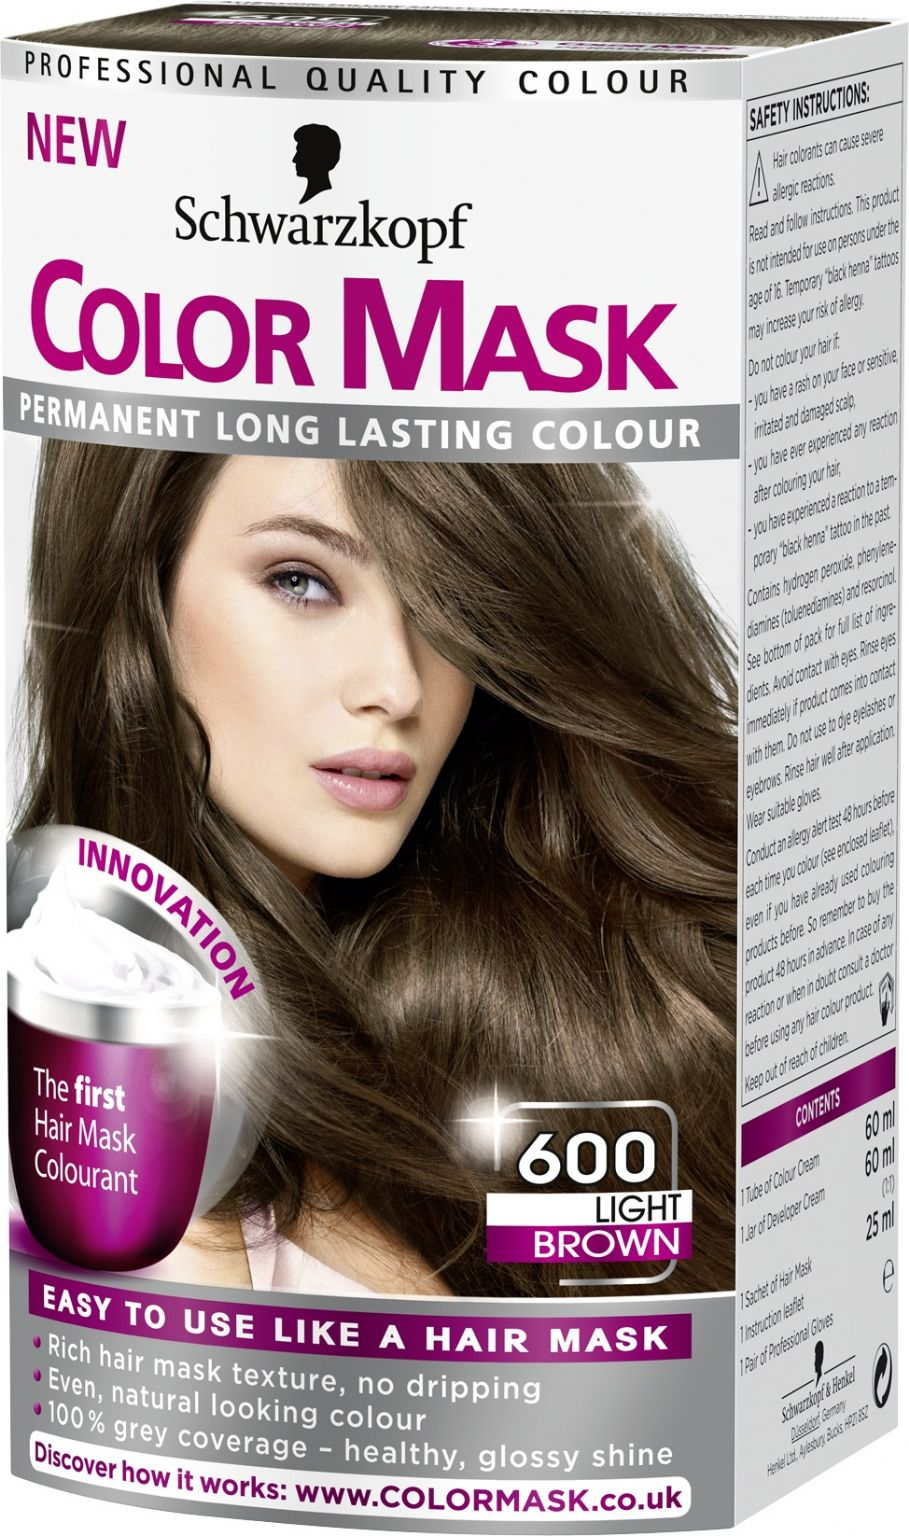 Schwarzkopf Color Mask Reviews Photo Makeupalley